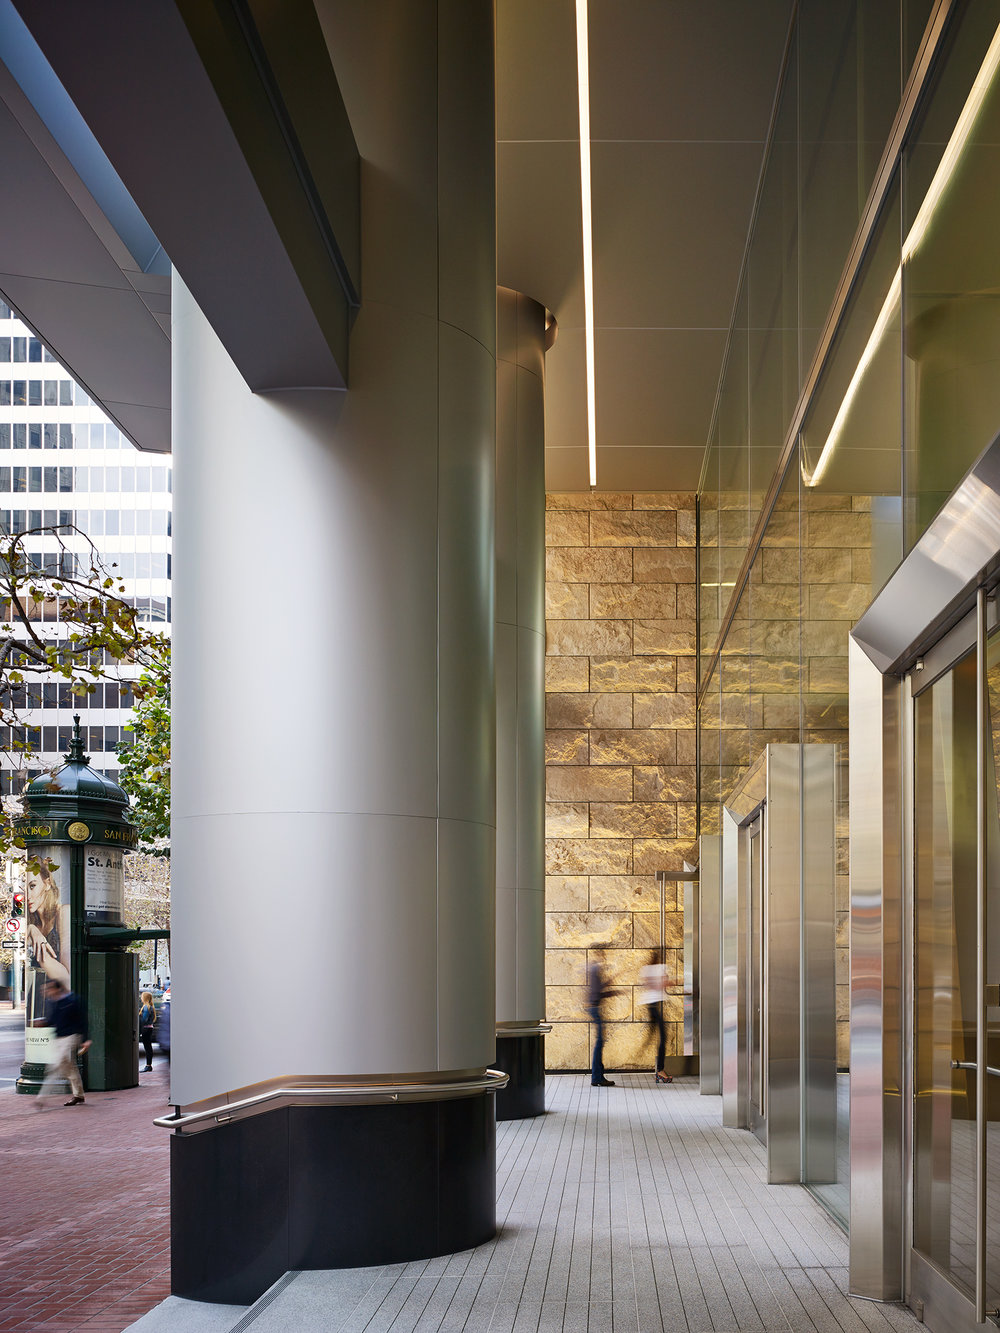 525 Market Street    Renovation Architect: KEATING    San Francisco, CA     Nick Merrick